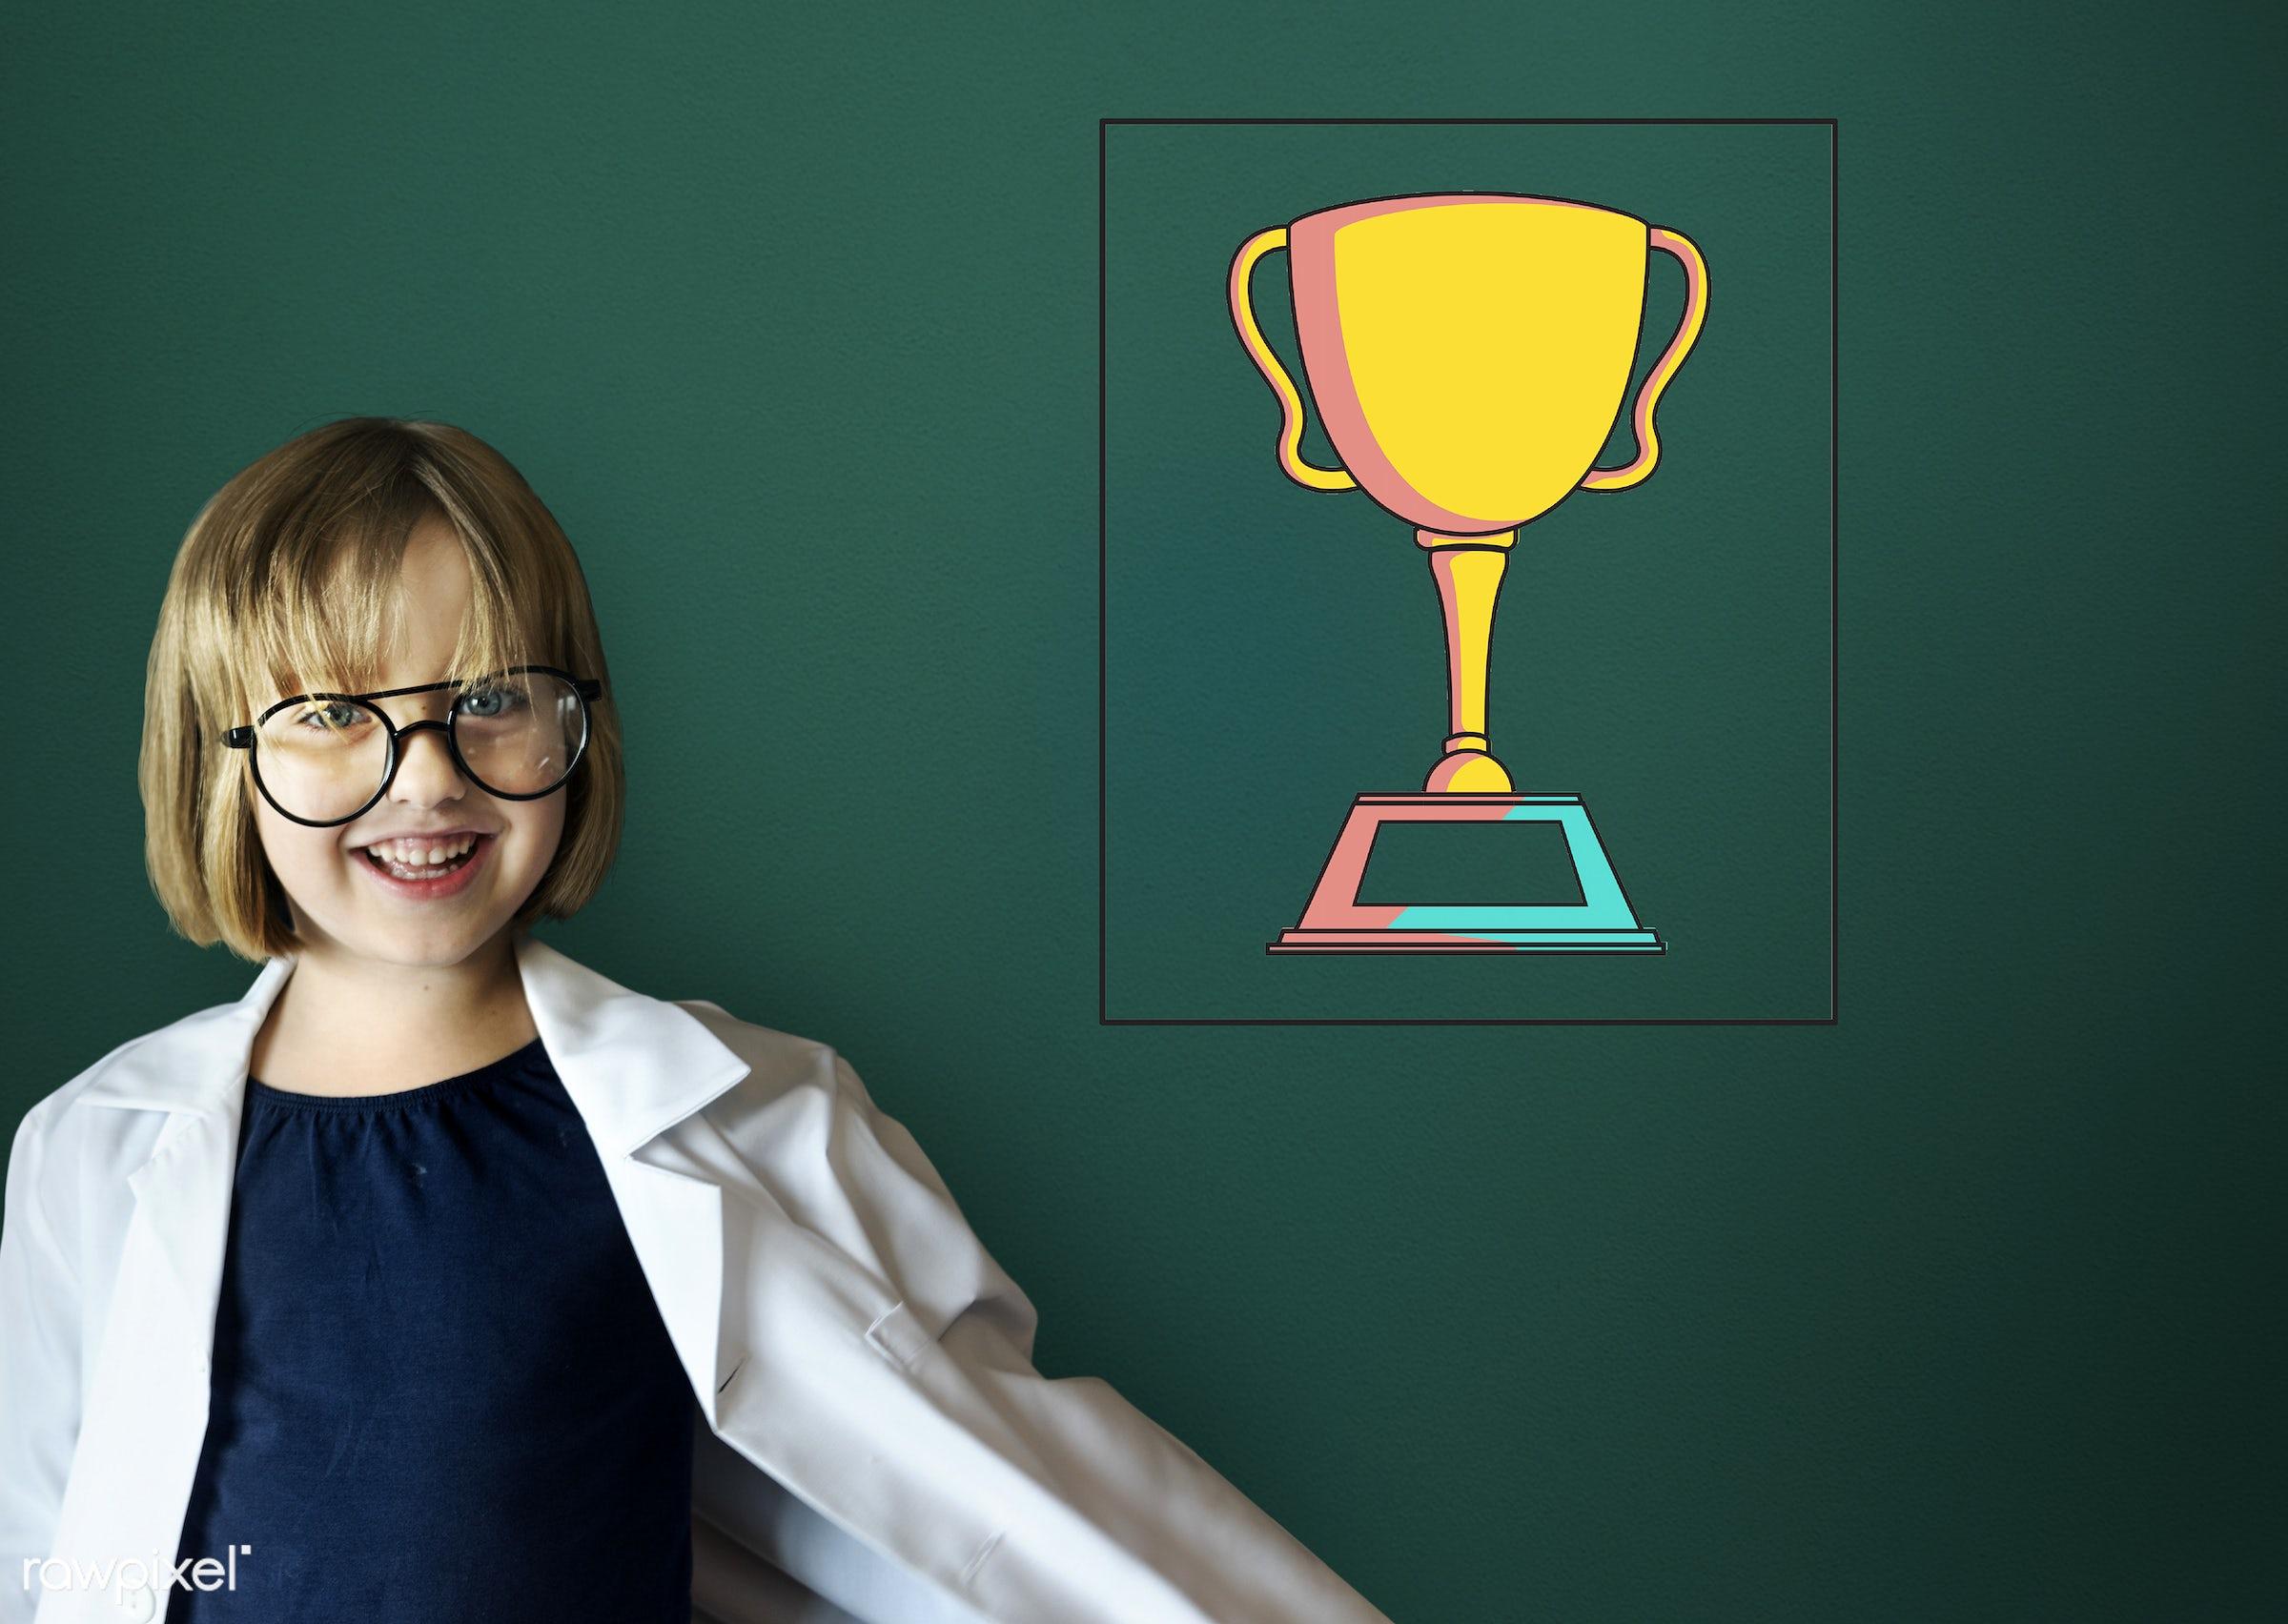 accomplishment, achievement, adorable, award, blackboard, cheerful, child, childhood, completion, cup, cute, dream job,...